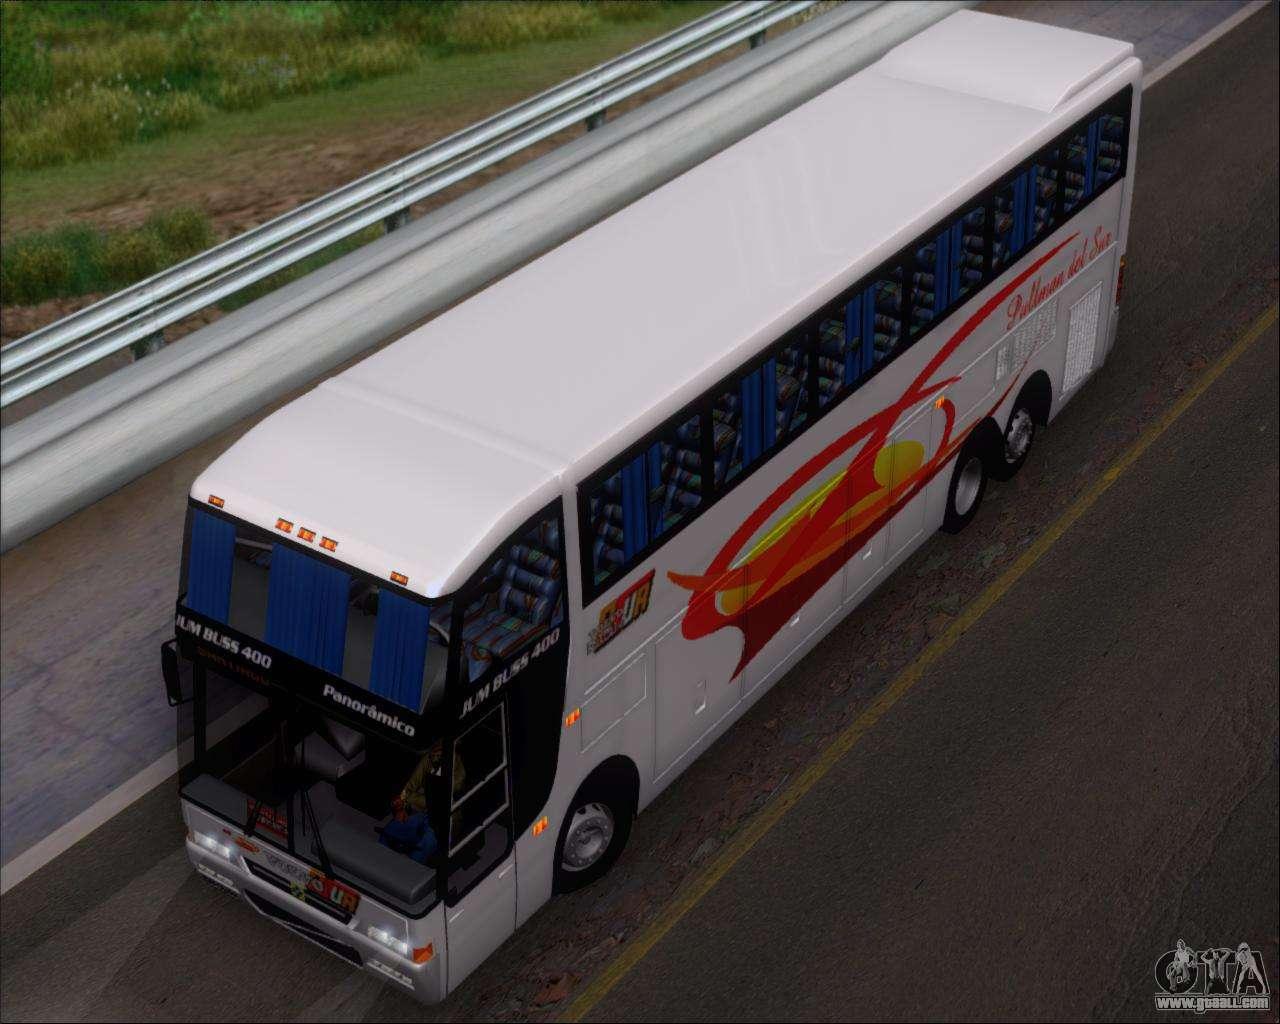 JUM DOWNLOAD GRATUITO BUSSCAR BUSS 400